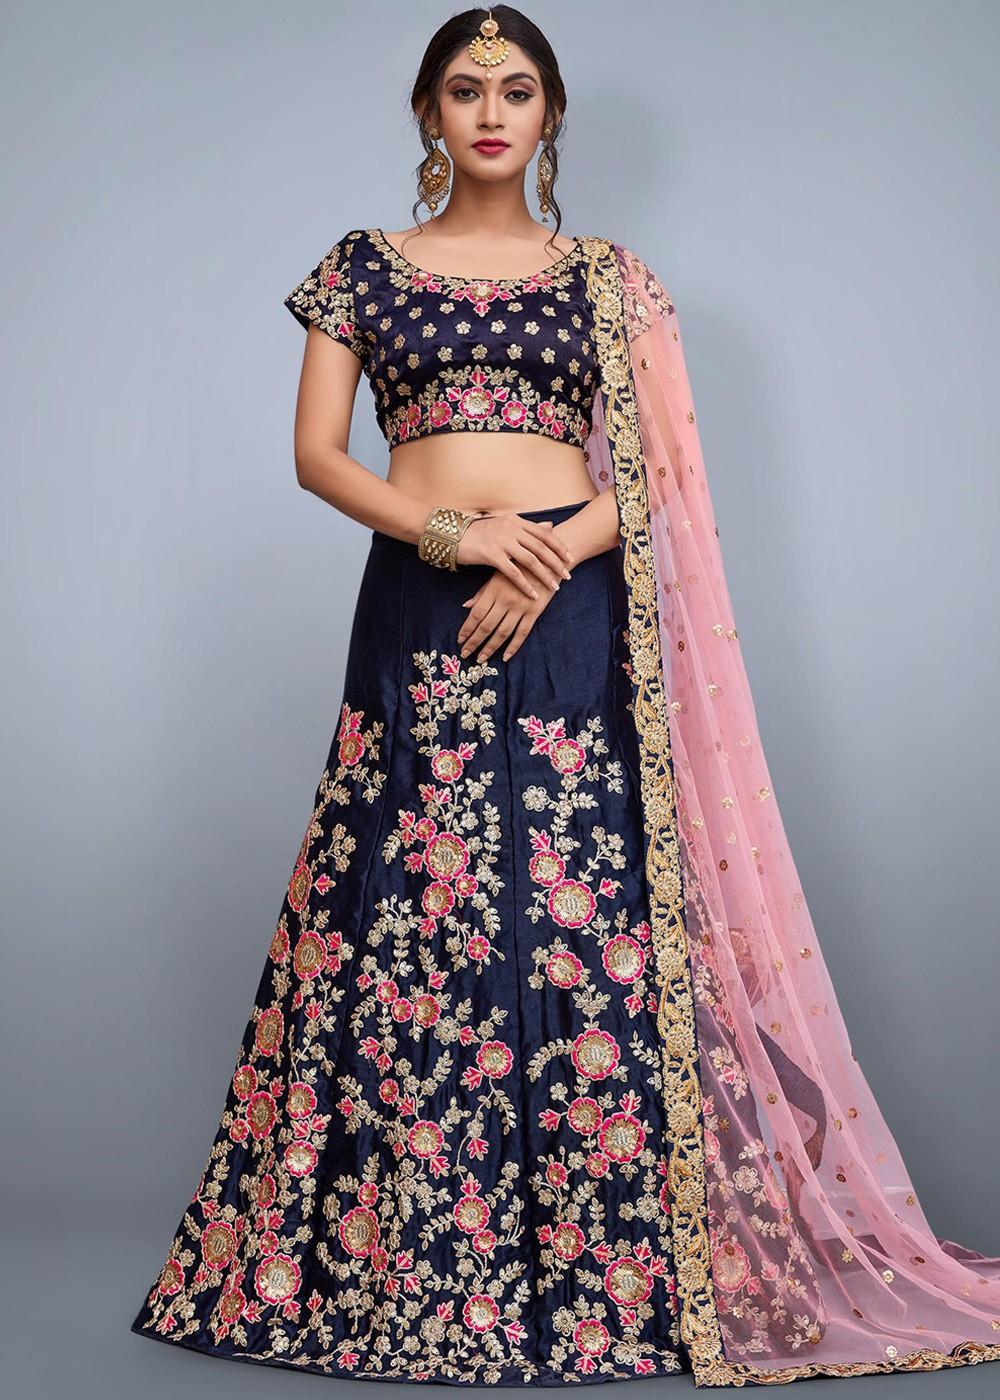 e8fe84dc340d7 Navy Blue Embroidered Art Silk Lehenga Choli Most Loved Styles 1718LG01